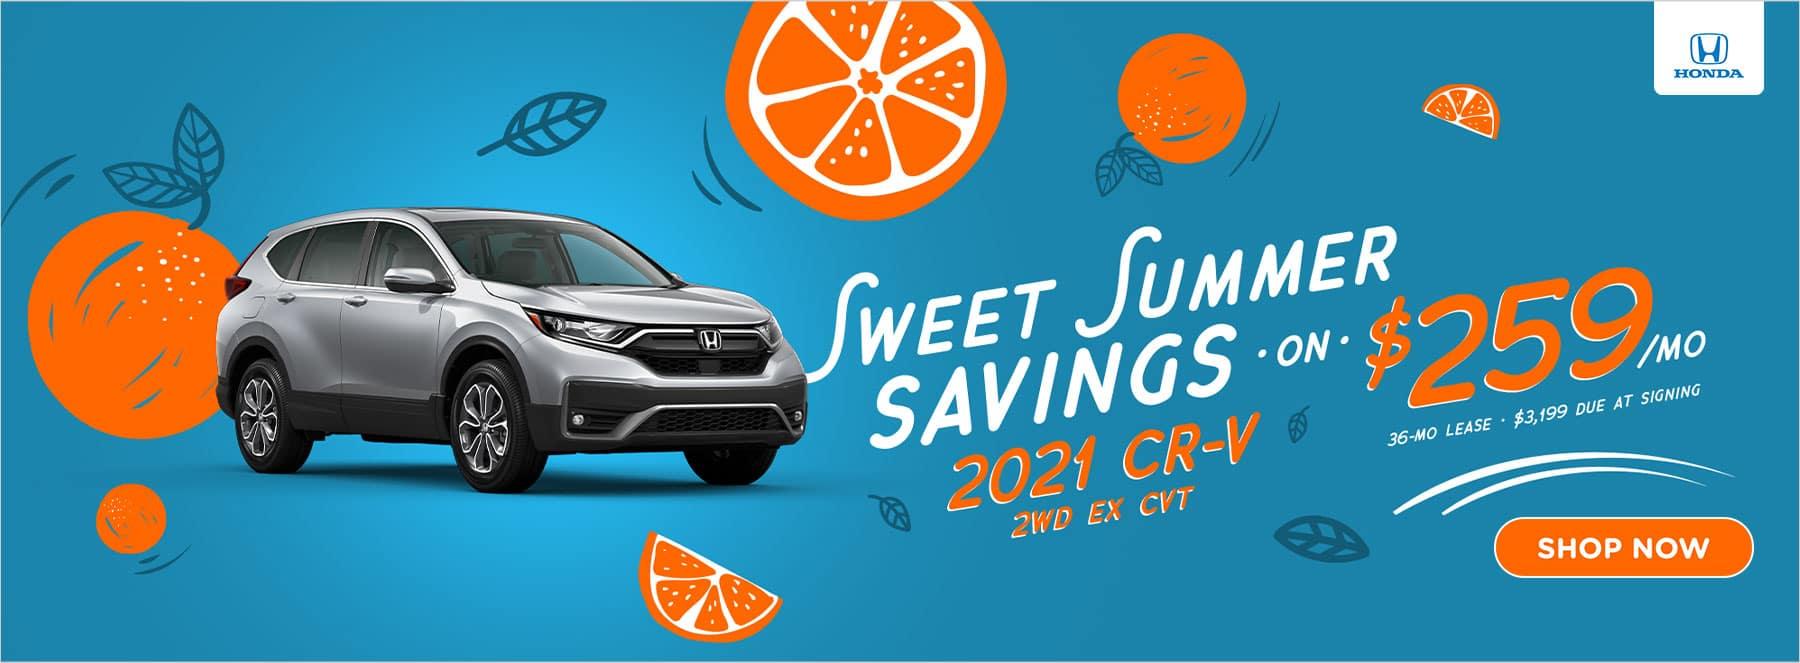 Sweet Summer Savings 2021 CR-V $259/mo